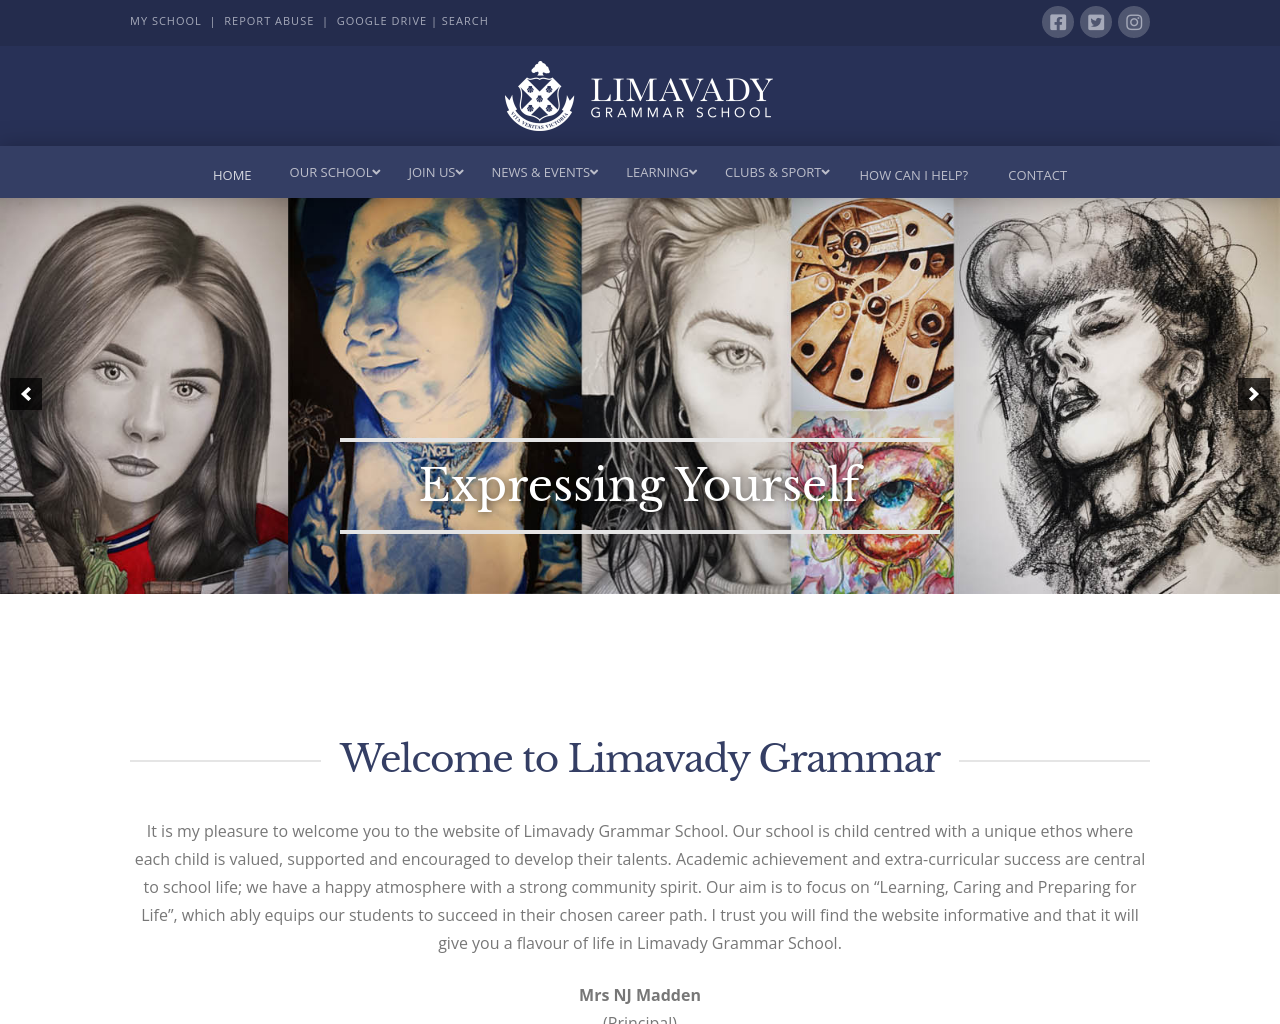 Limavady Grammar School Website